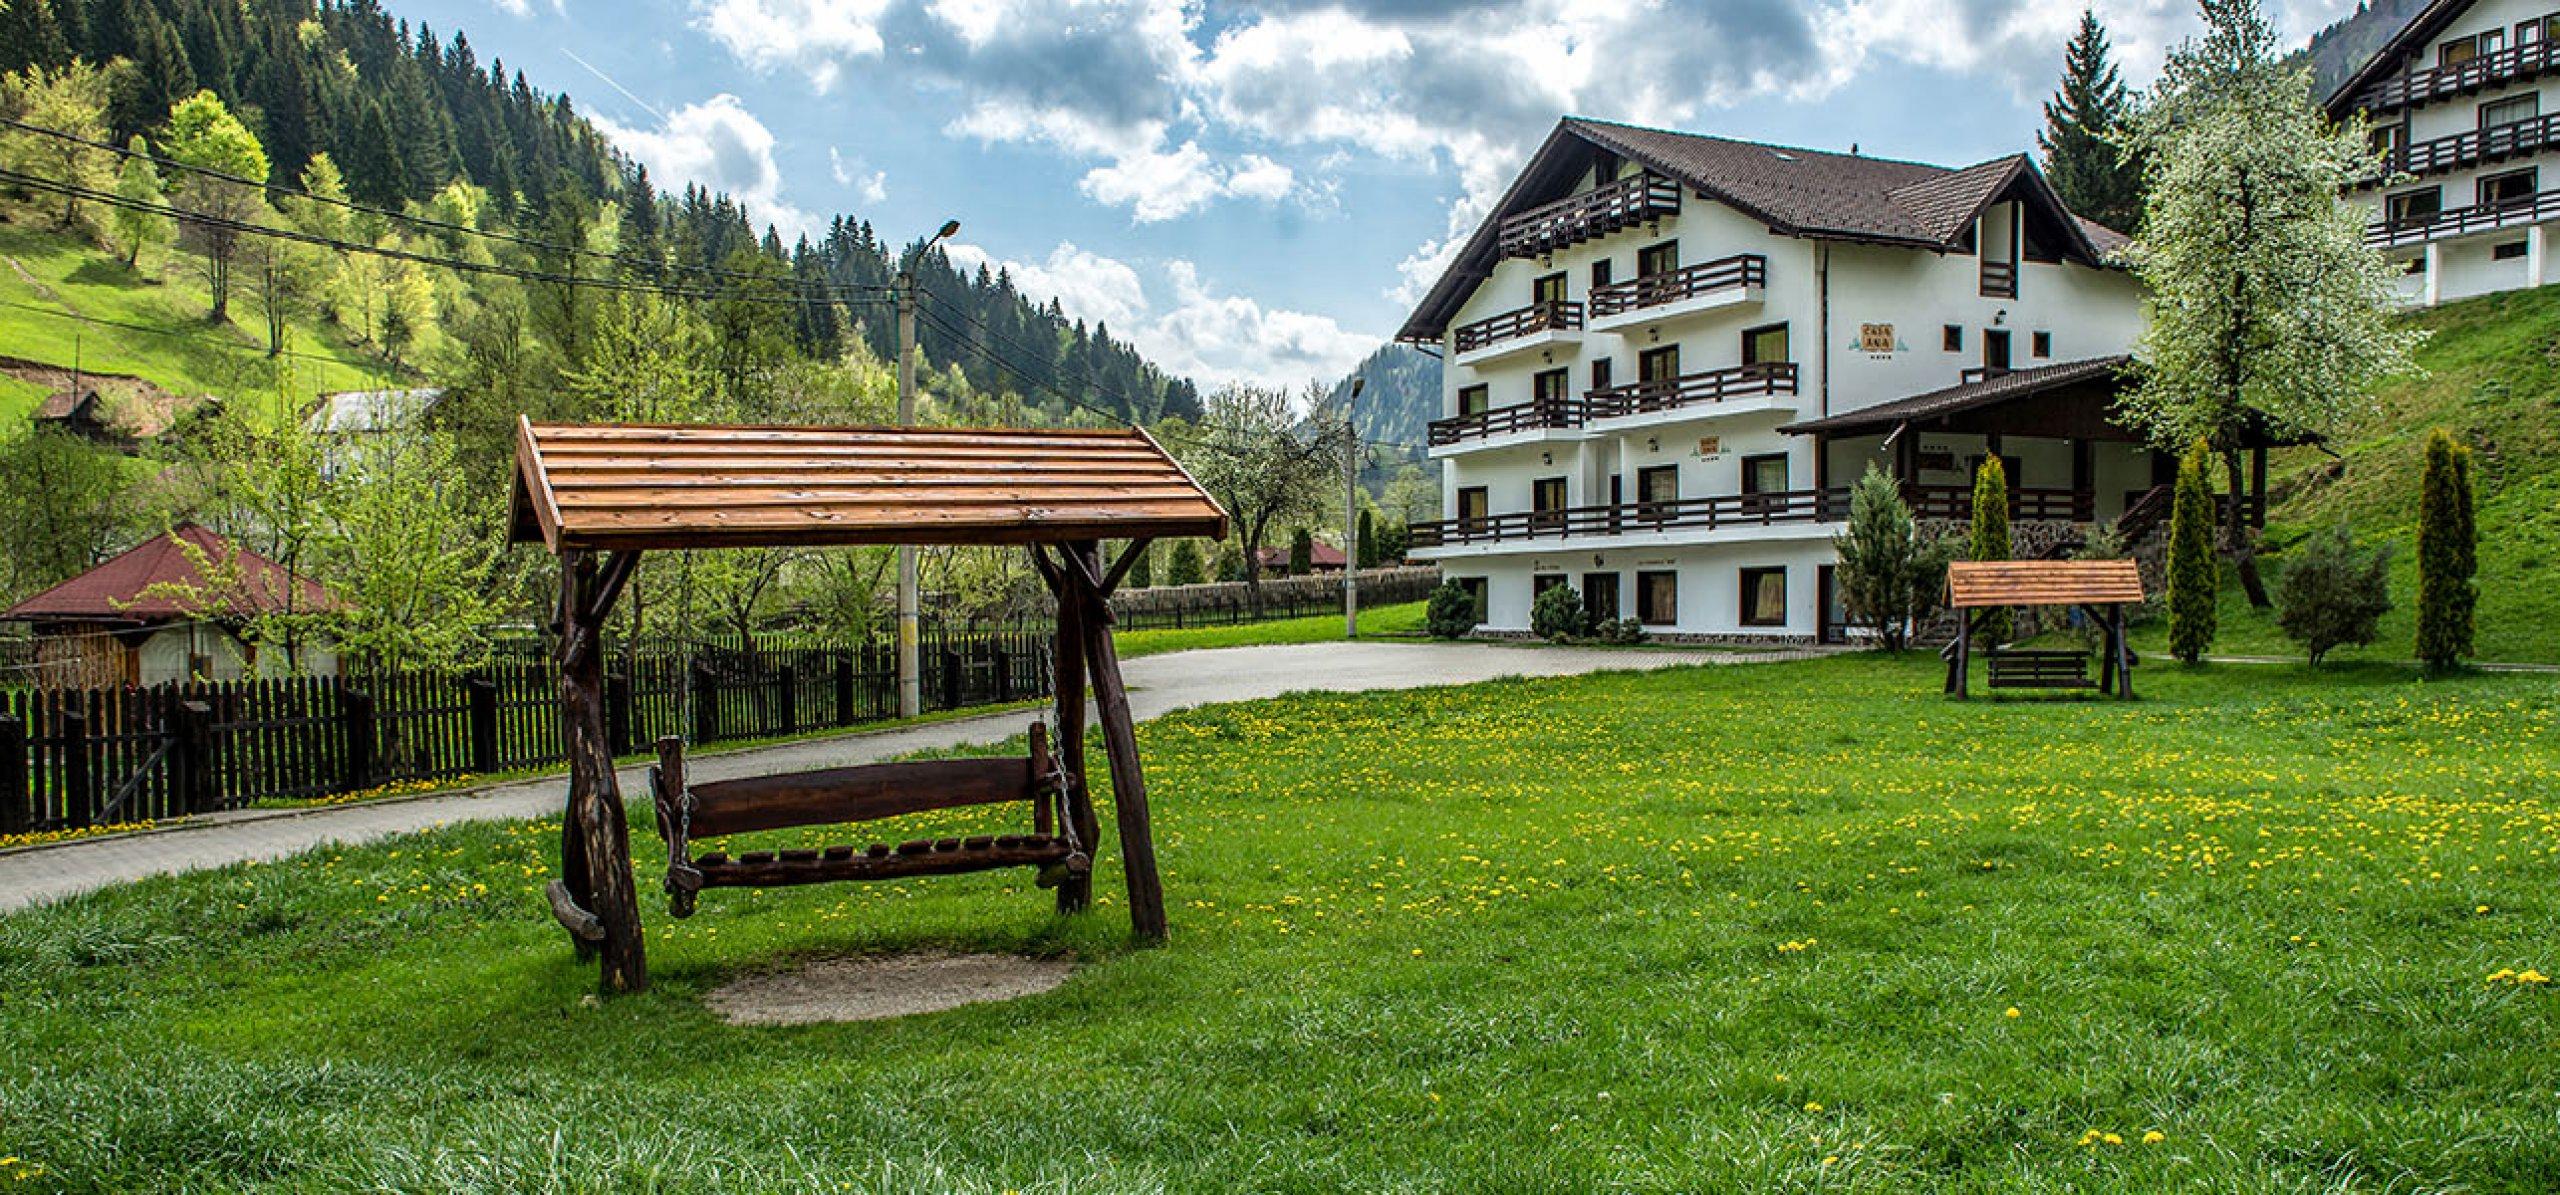 ansamblul-hotel-cheia-hoteluri-moeciu-2